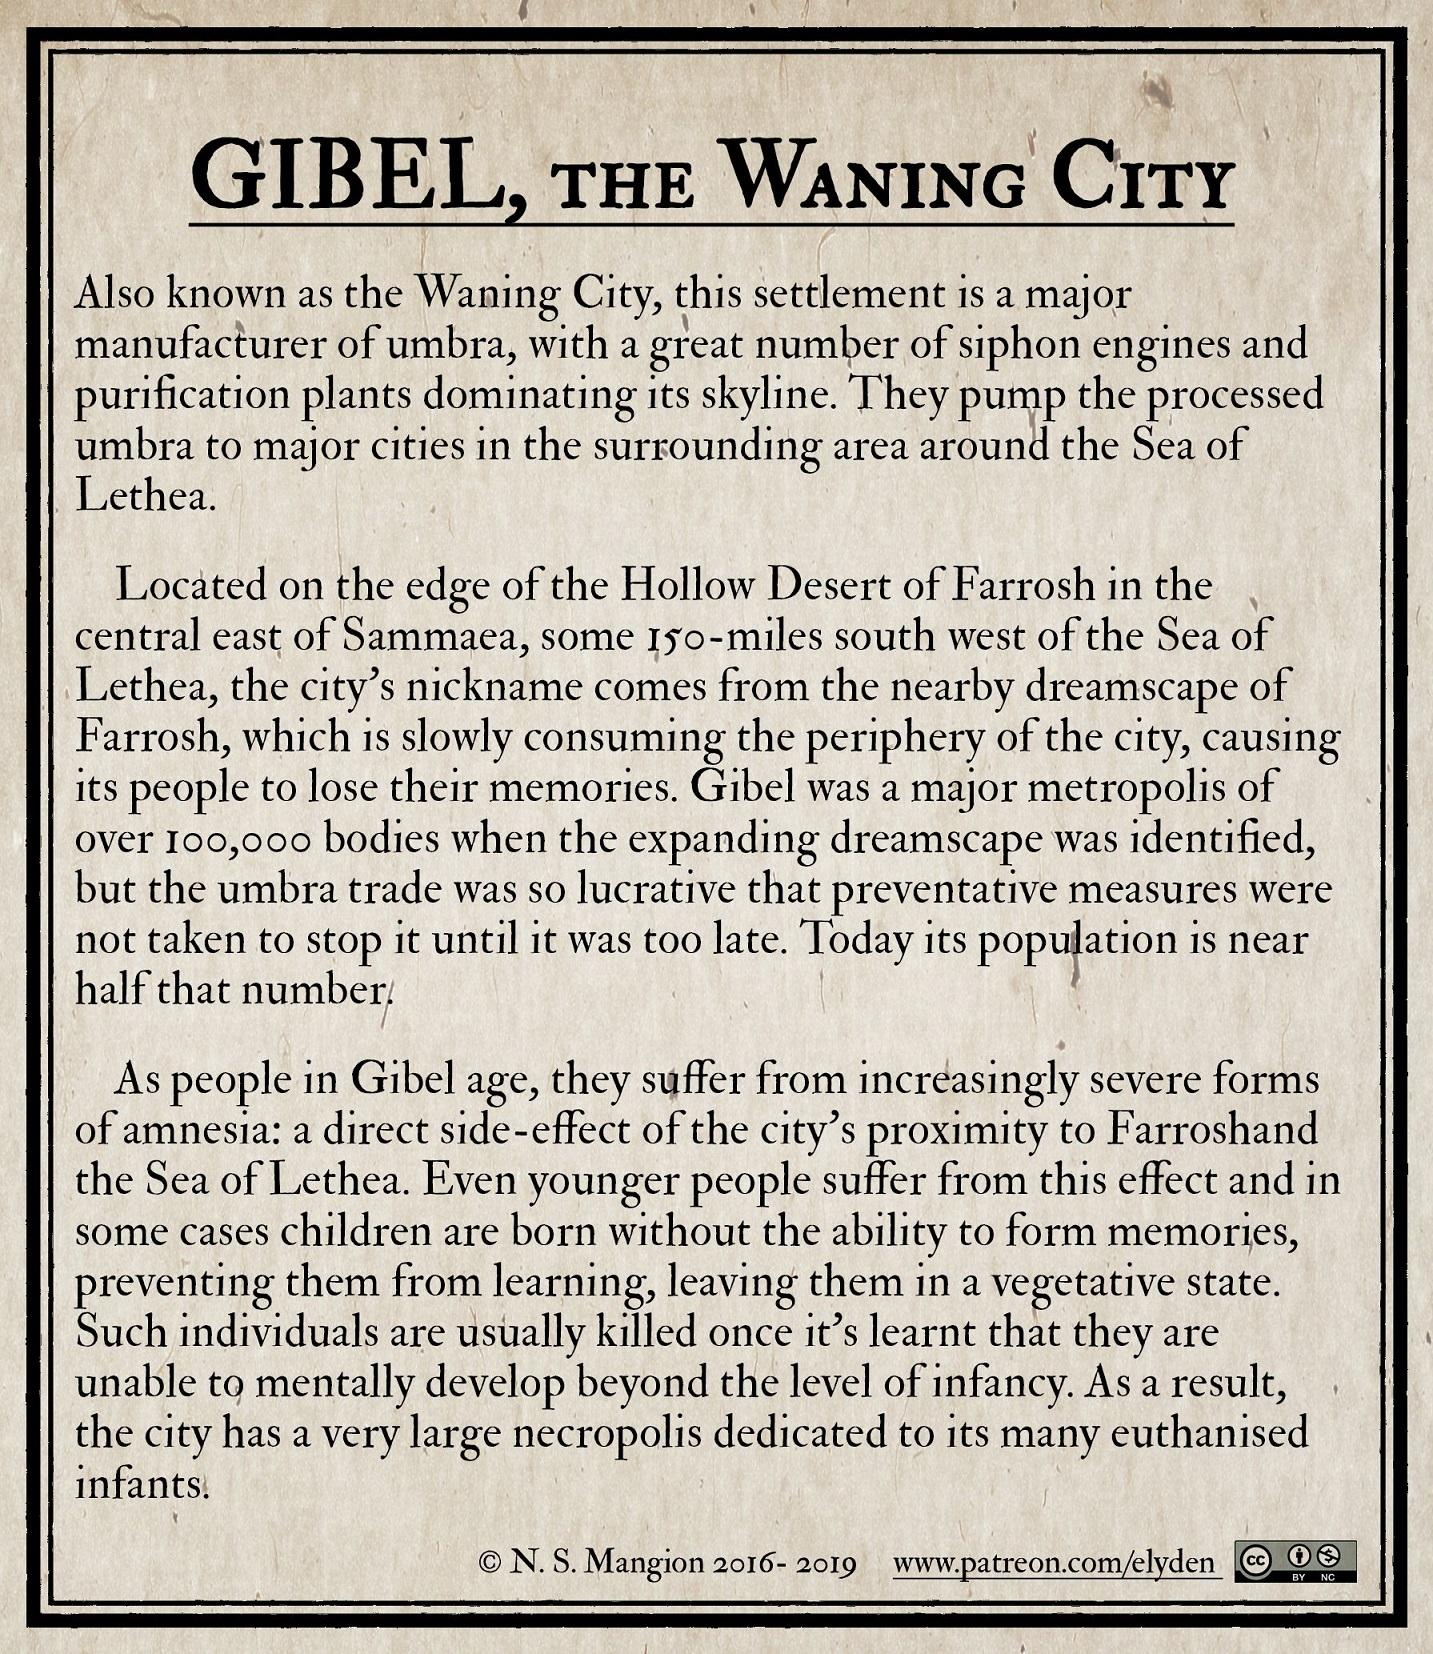 Gibel, the Waning City